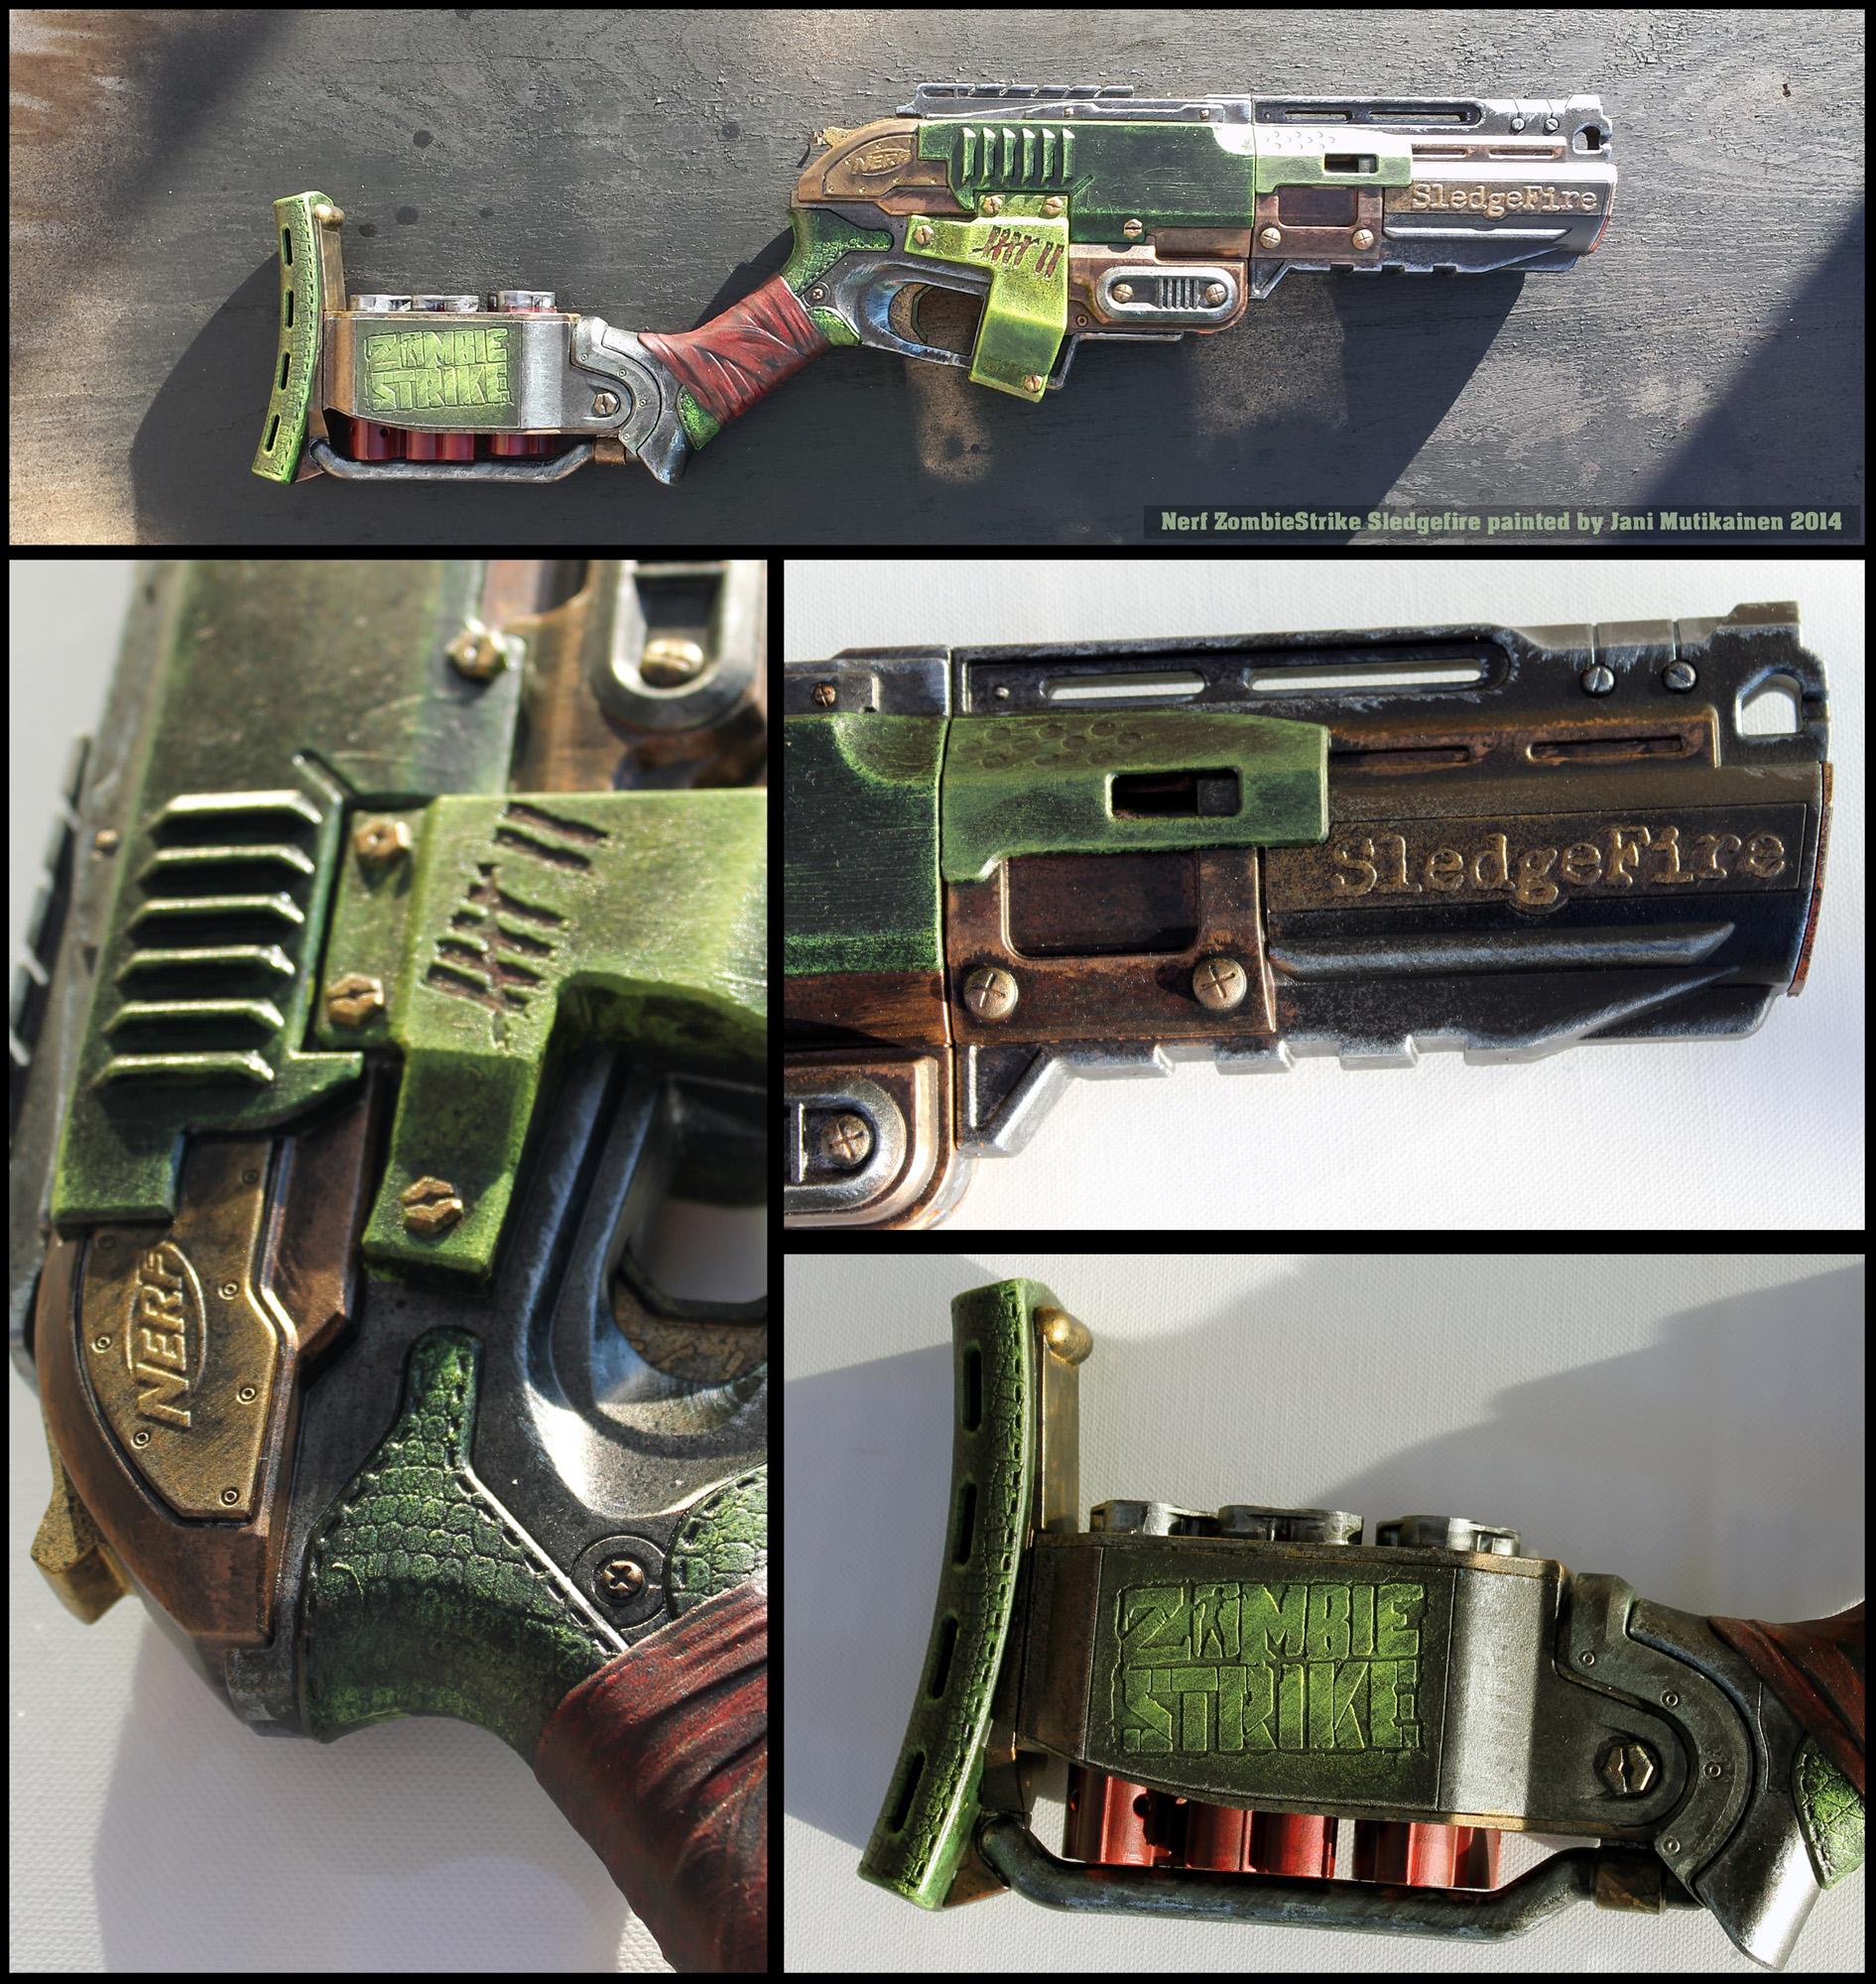 hoellenhamster 9 5 Nerf ZombieStrike Sledgefire paintjob 001 by janimutikainen